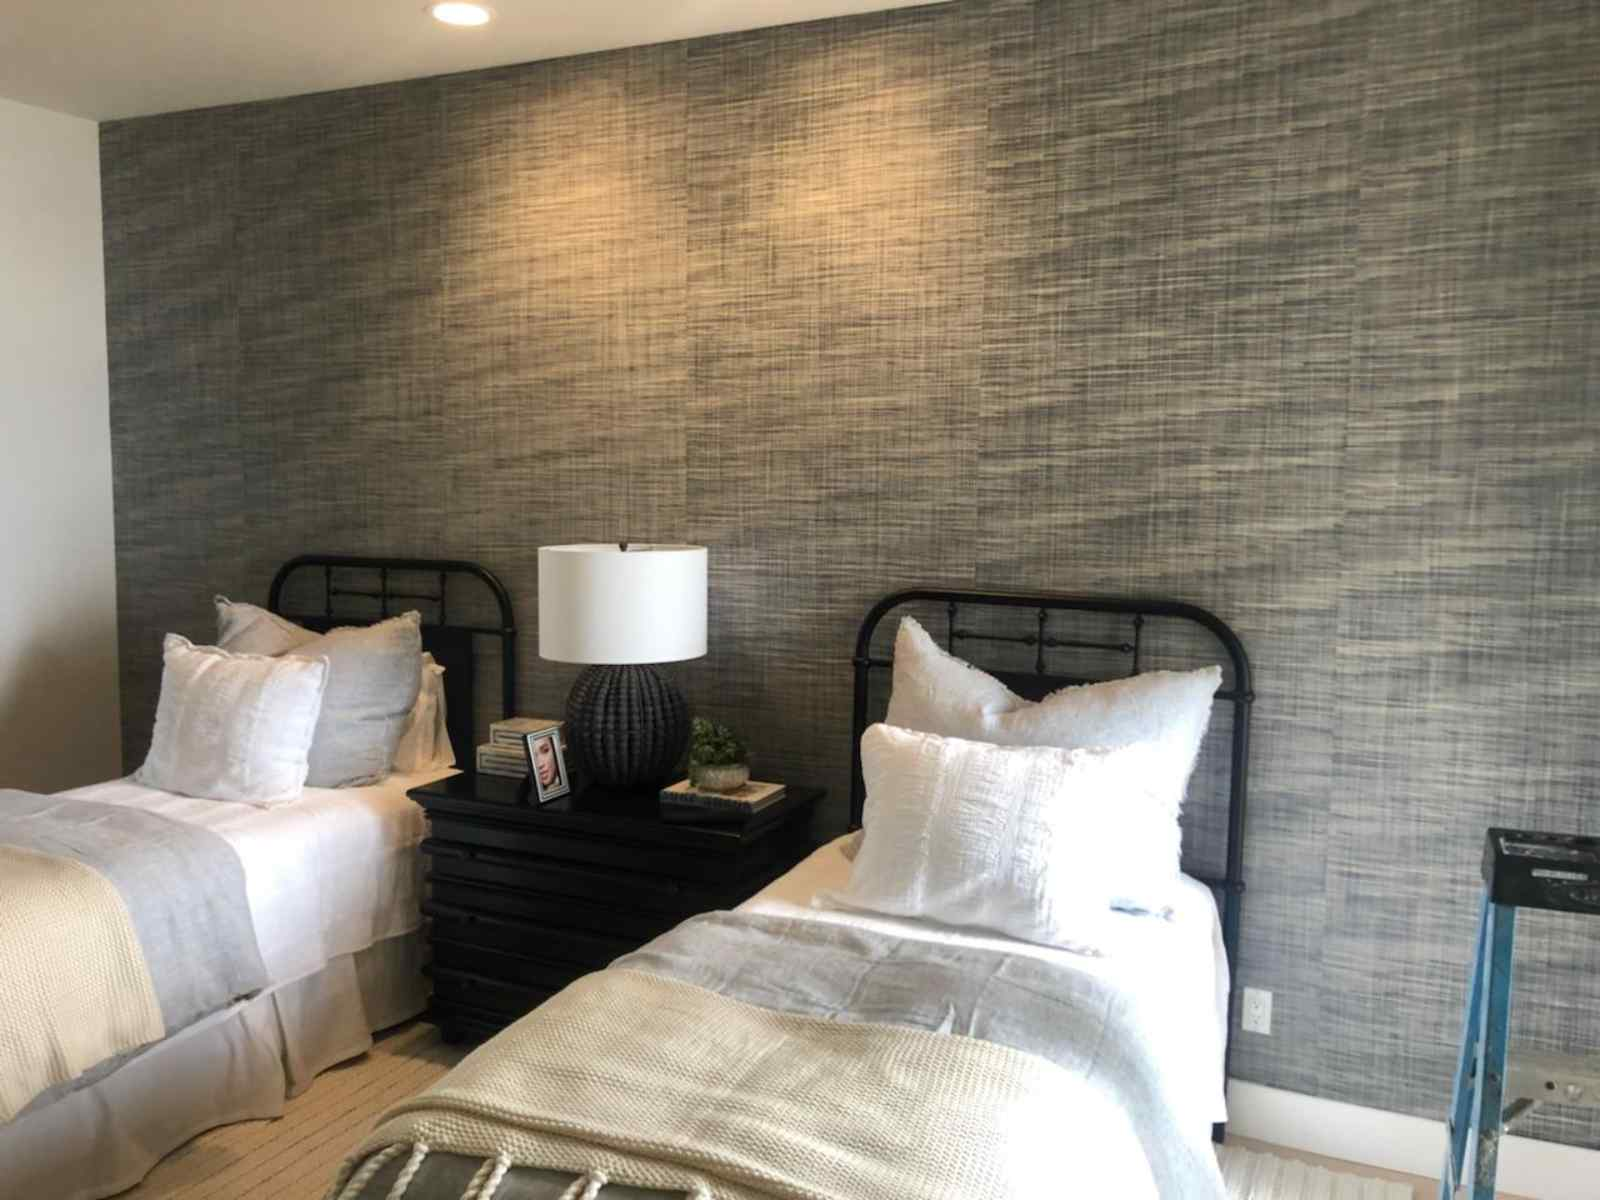 Commercial Wallcovering & Installation